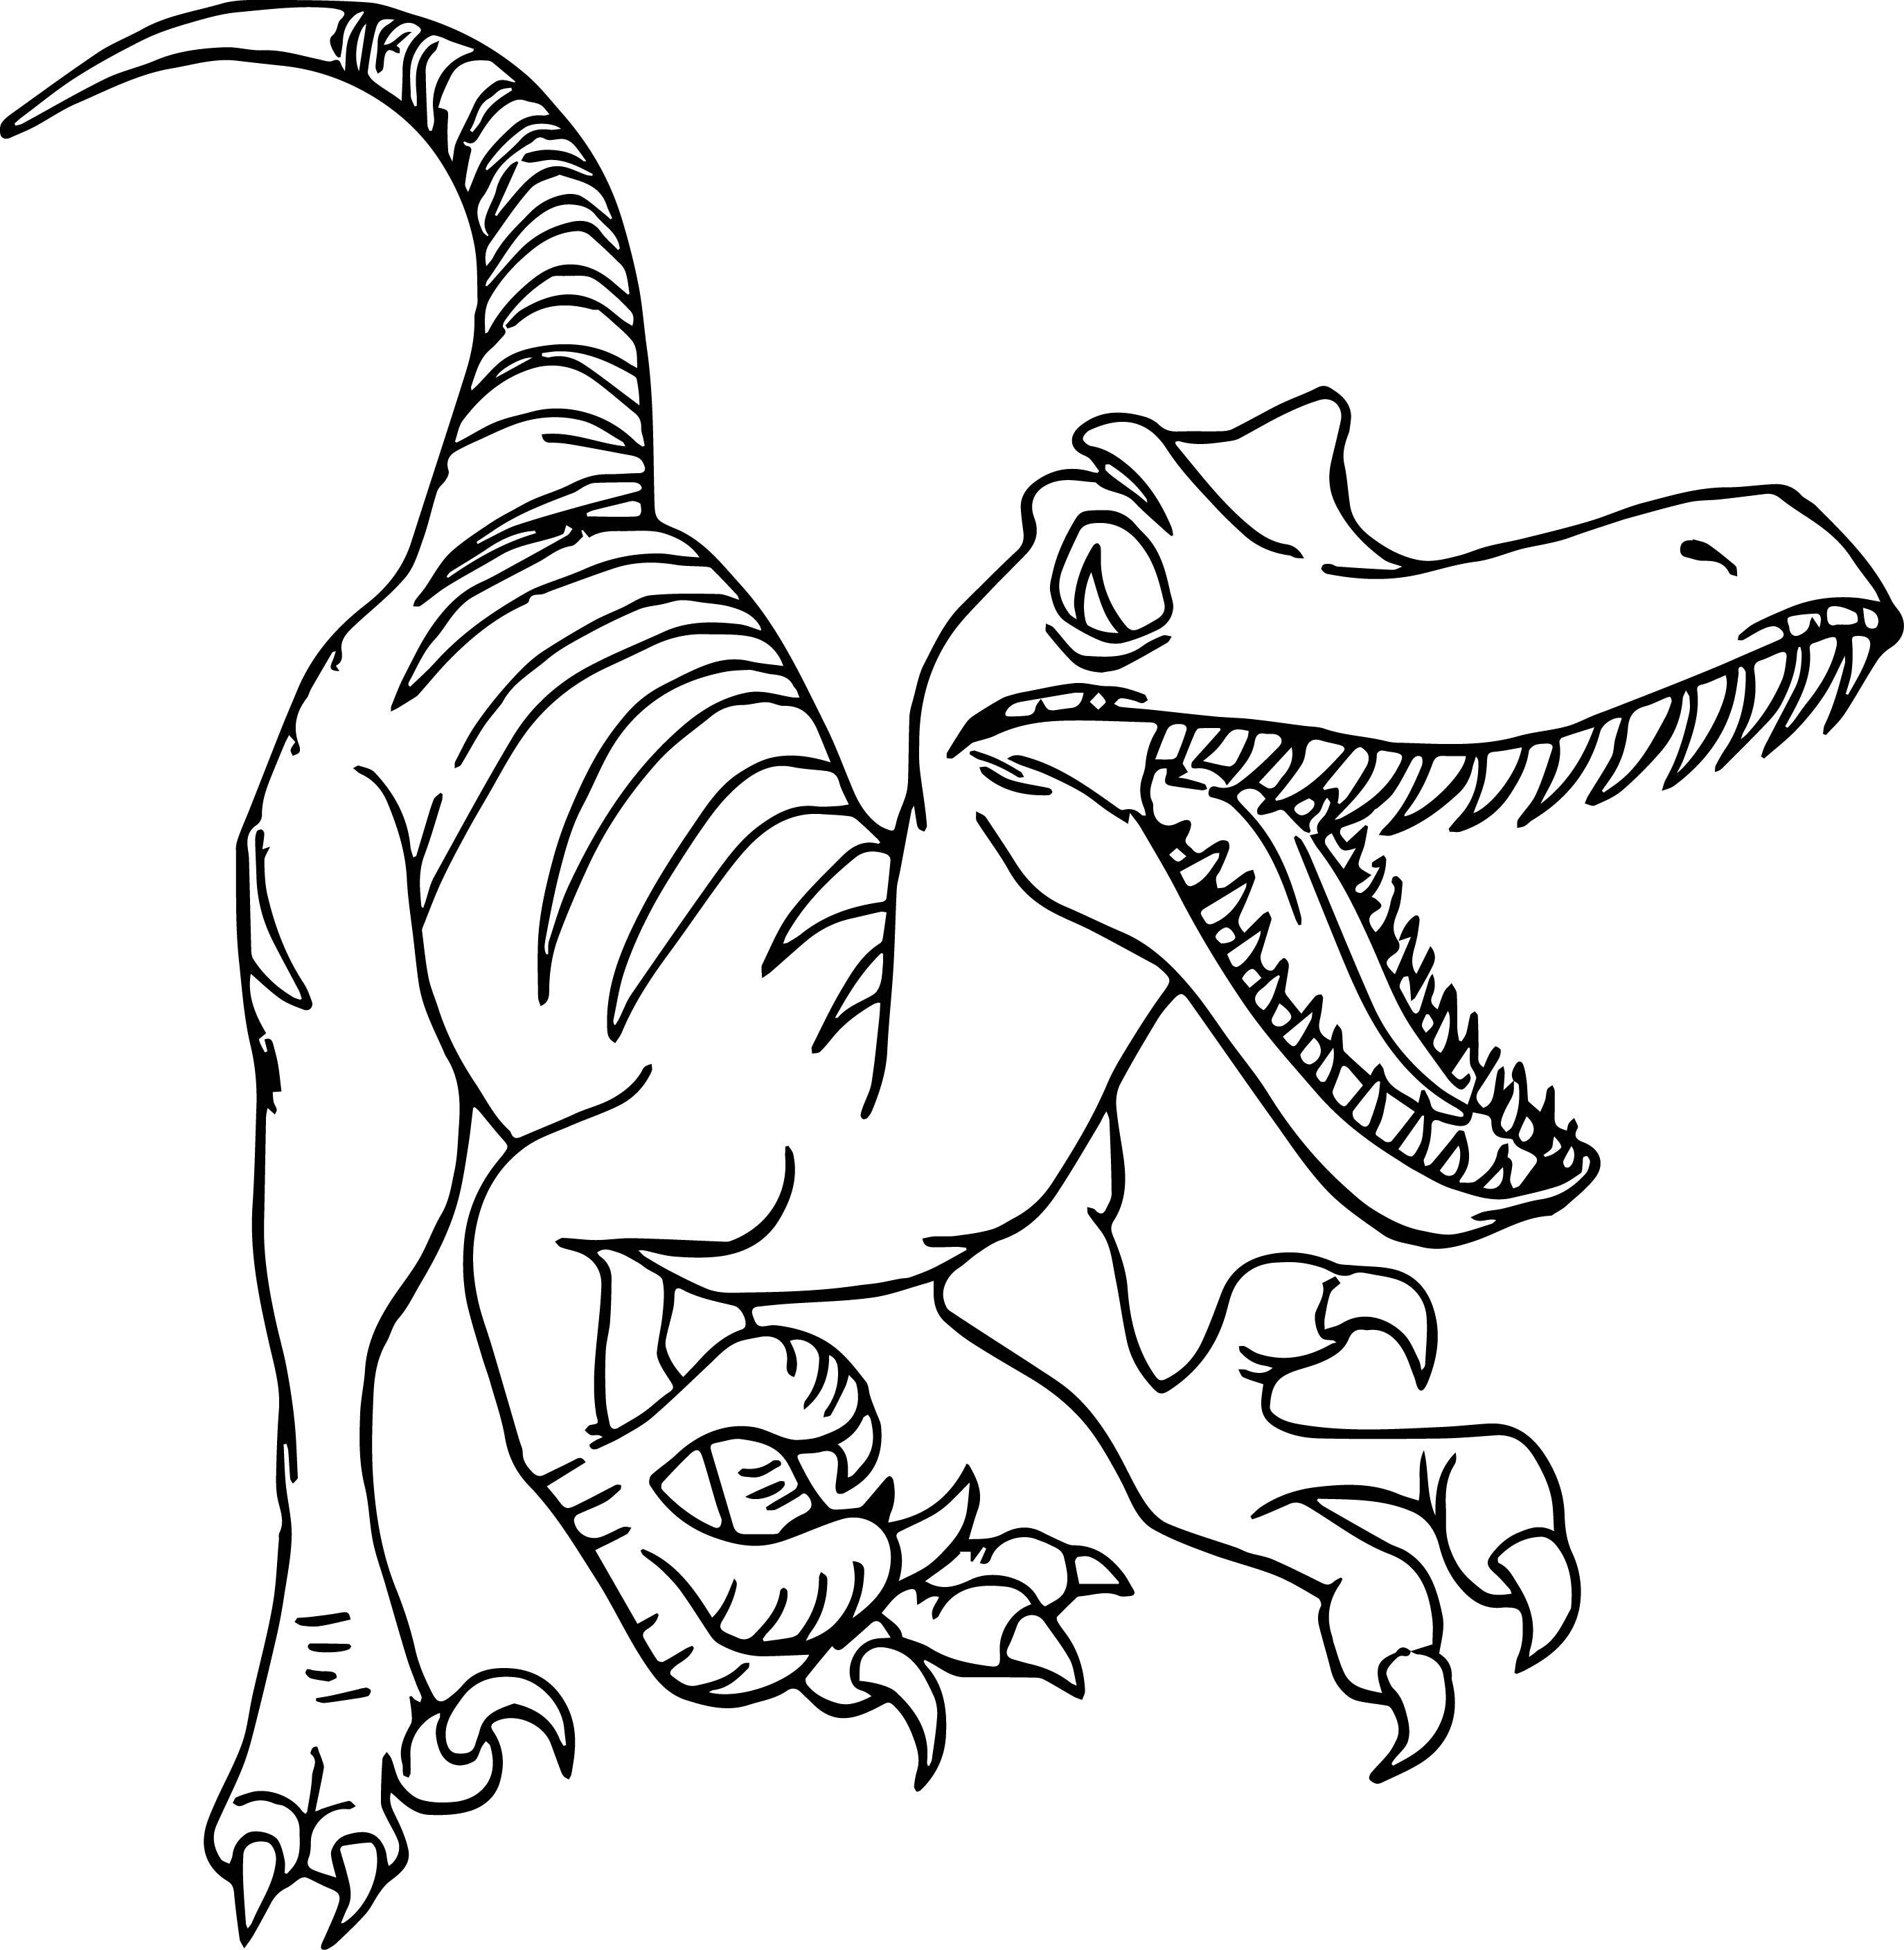 Raptor Dinosaur Coloring Pages at GetDrawings | Free download